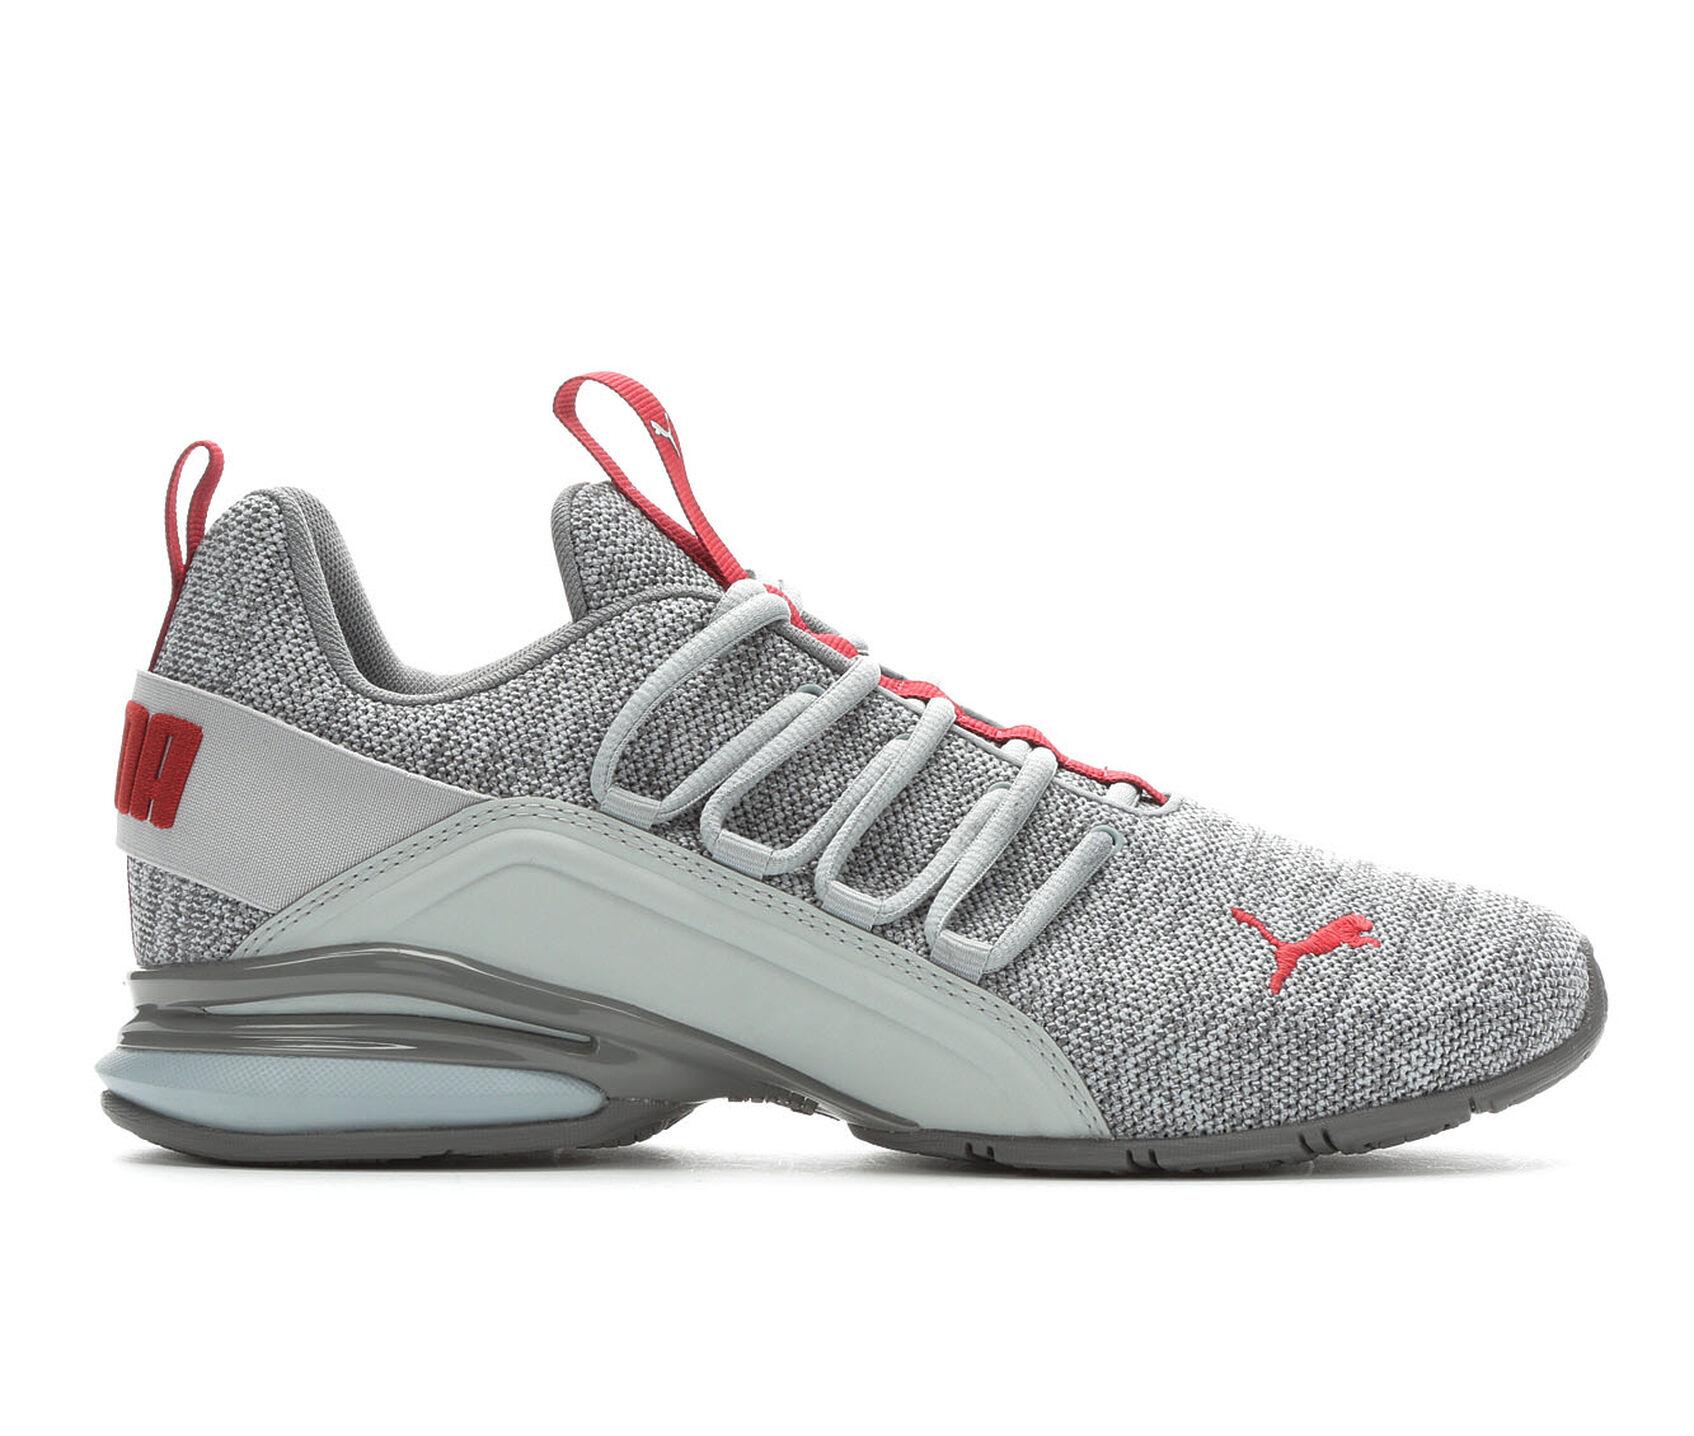 a6652d4dbd0 Men s Puma Axelion Knit Sneakers